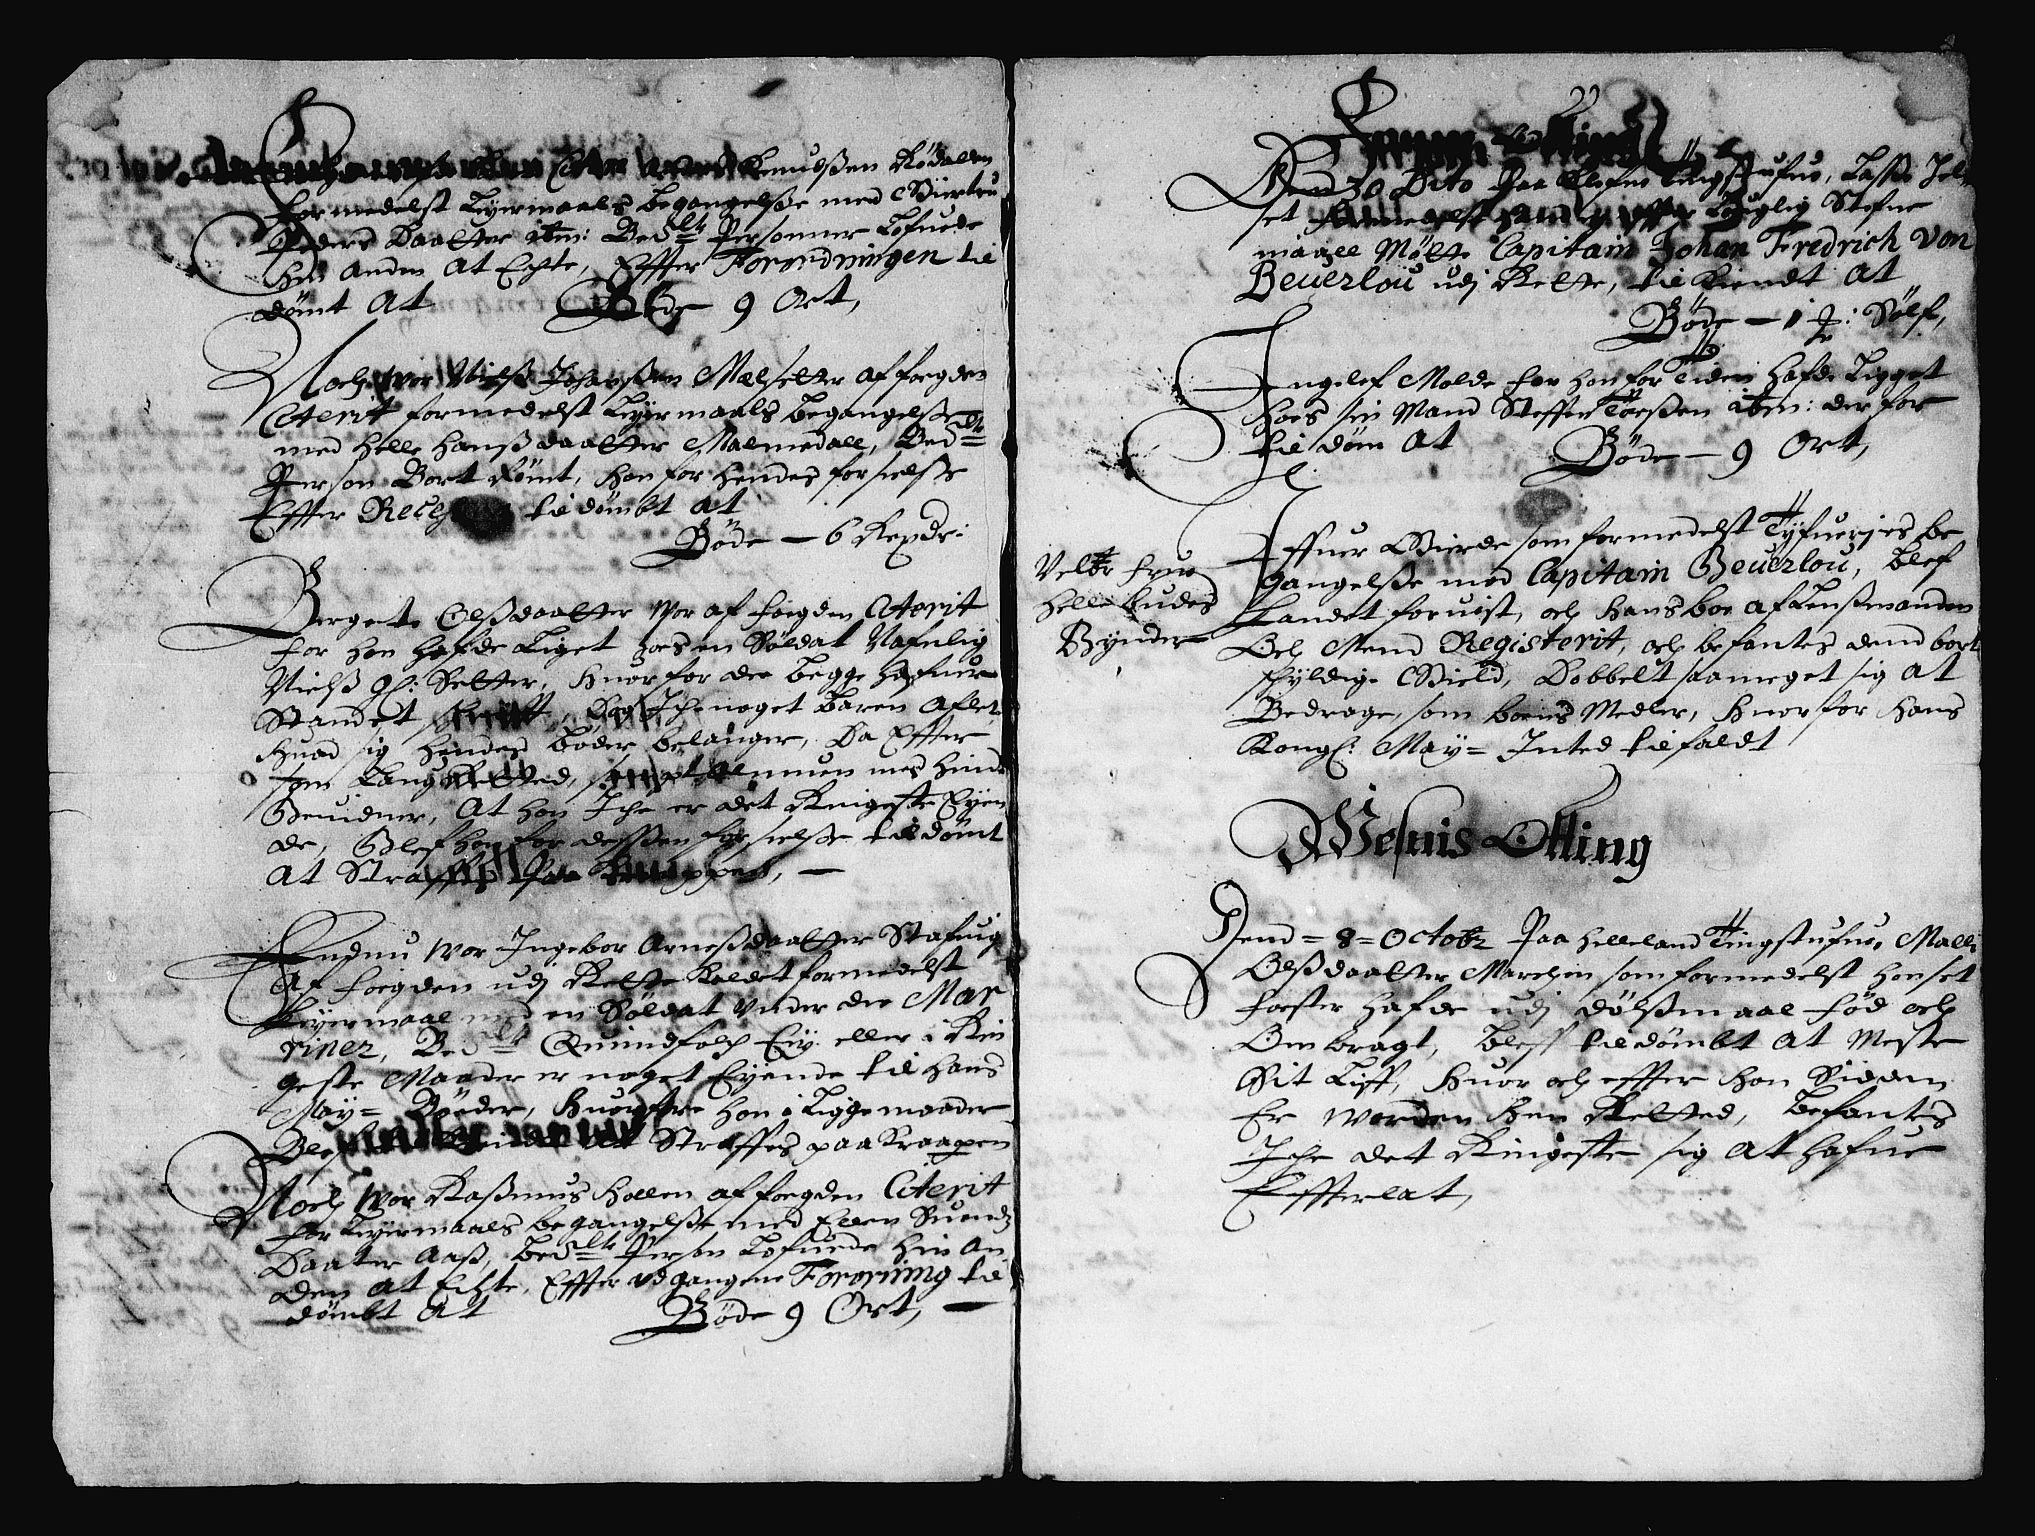 RA, Rentekammeret inntil 1814, Reviderte regnskaper, Stiftamtstueregnskaper, Trondheim stiftamt og Nordland amt, R/Rg/L0073: Trondheim stiftamt og Nordland amt, 1683